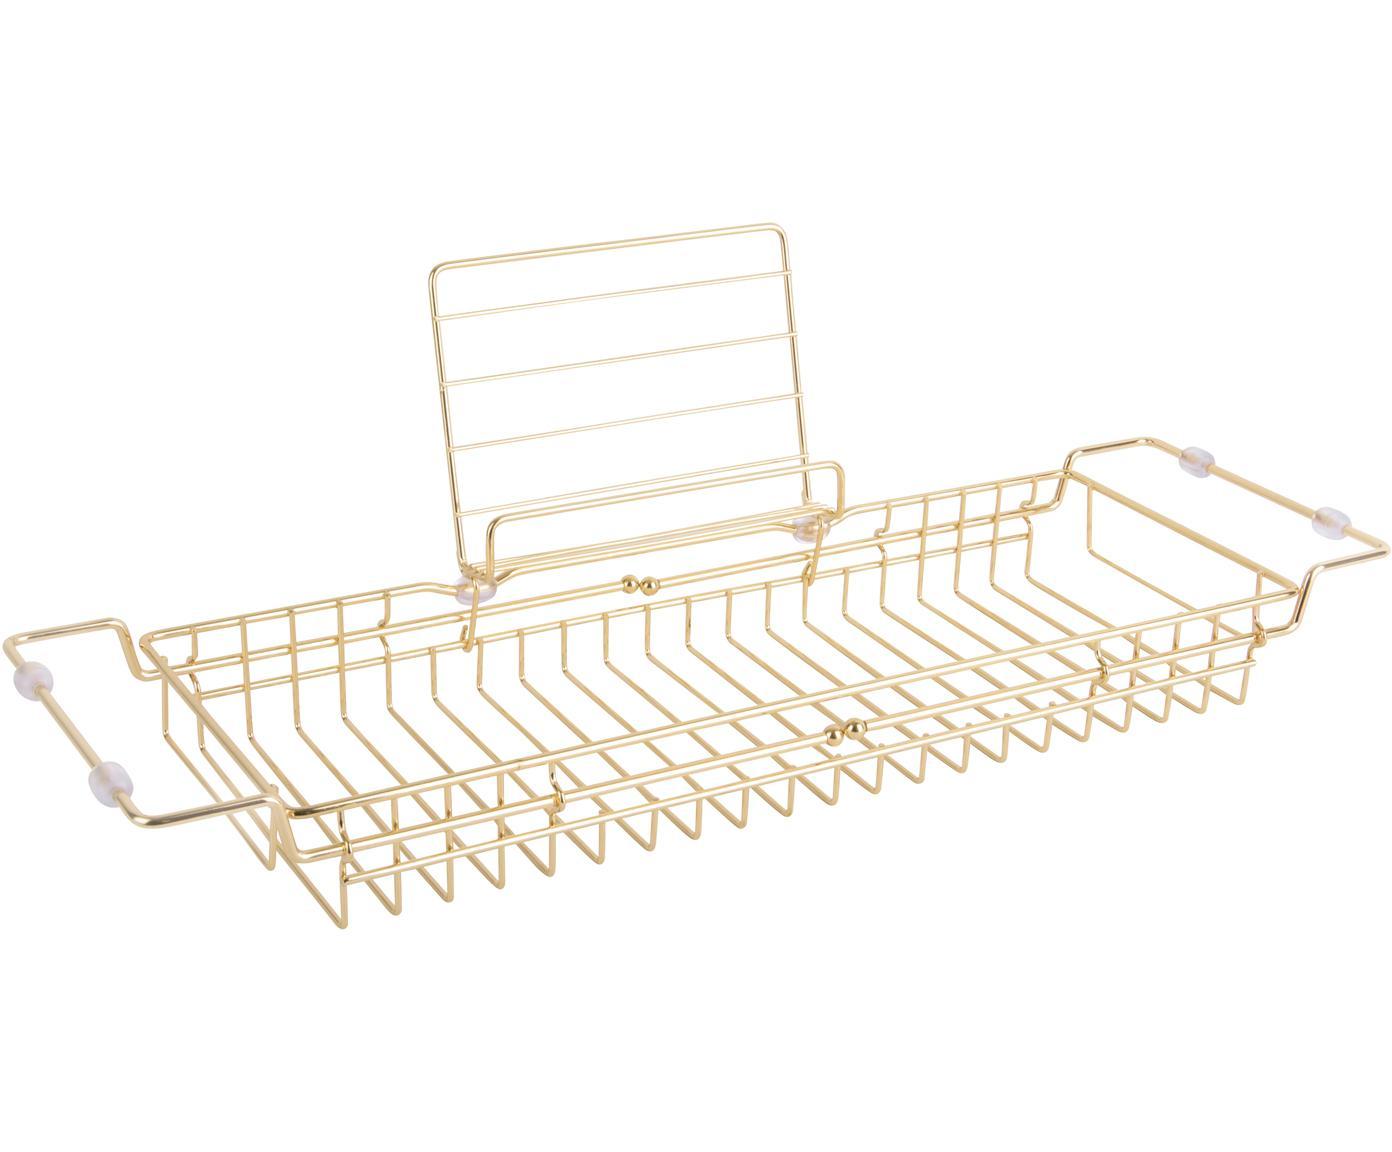 Mensoletta per la vasca Tubad, Metallo rivestito, Dorato, Larg. 61 x Alt. 18 cm